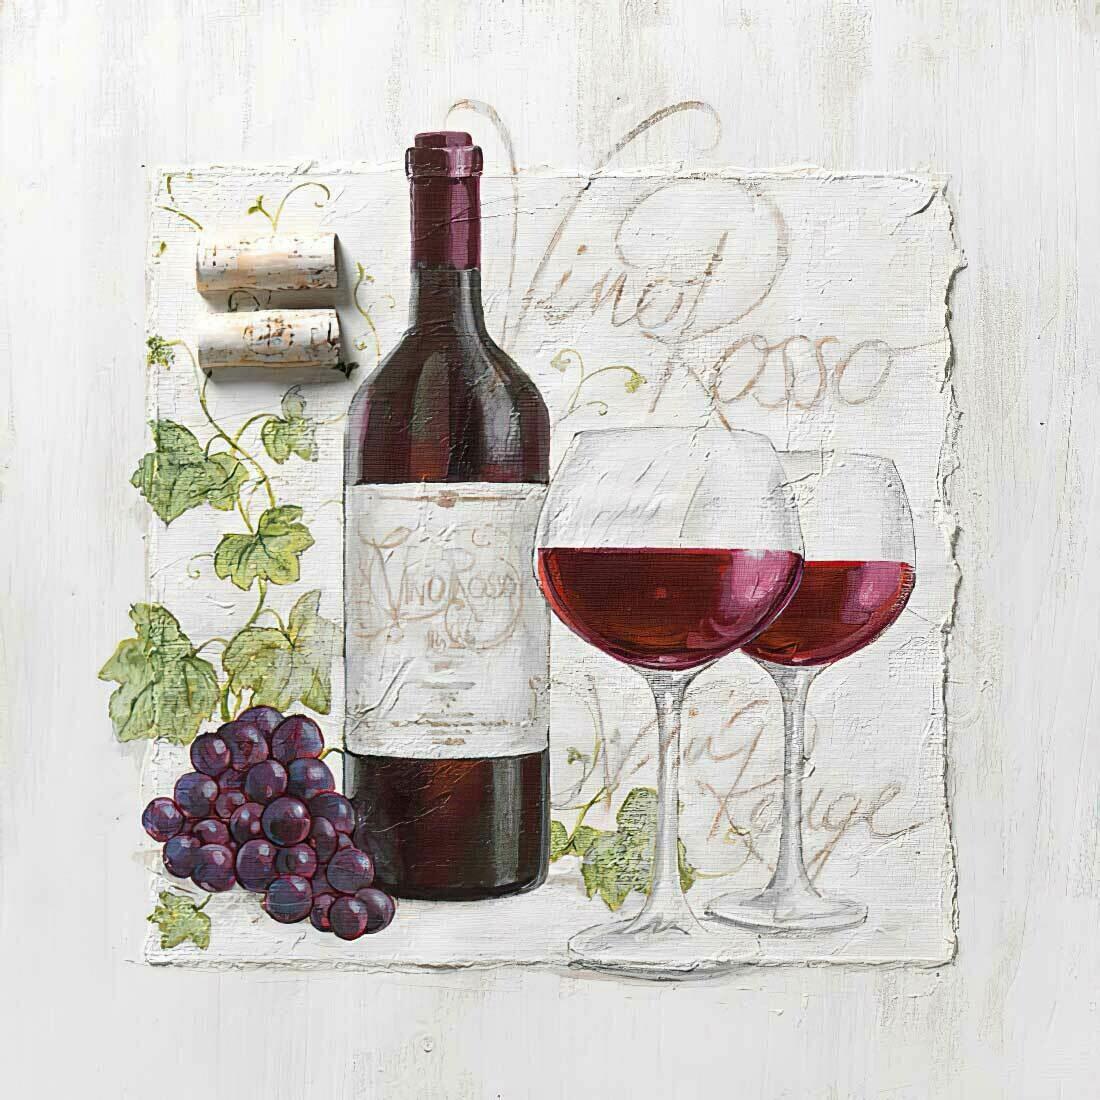 Decoupage Paper Napkins - Wine - Vino Rosso 13x13 (1 Sheet)